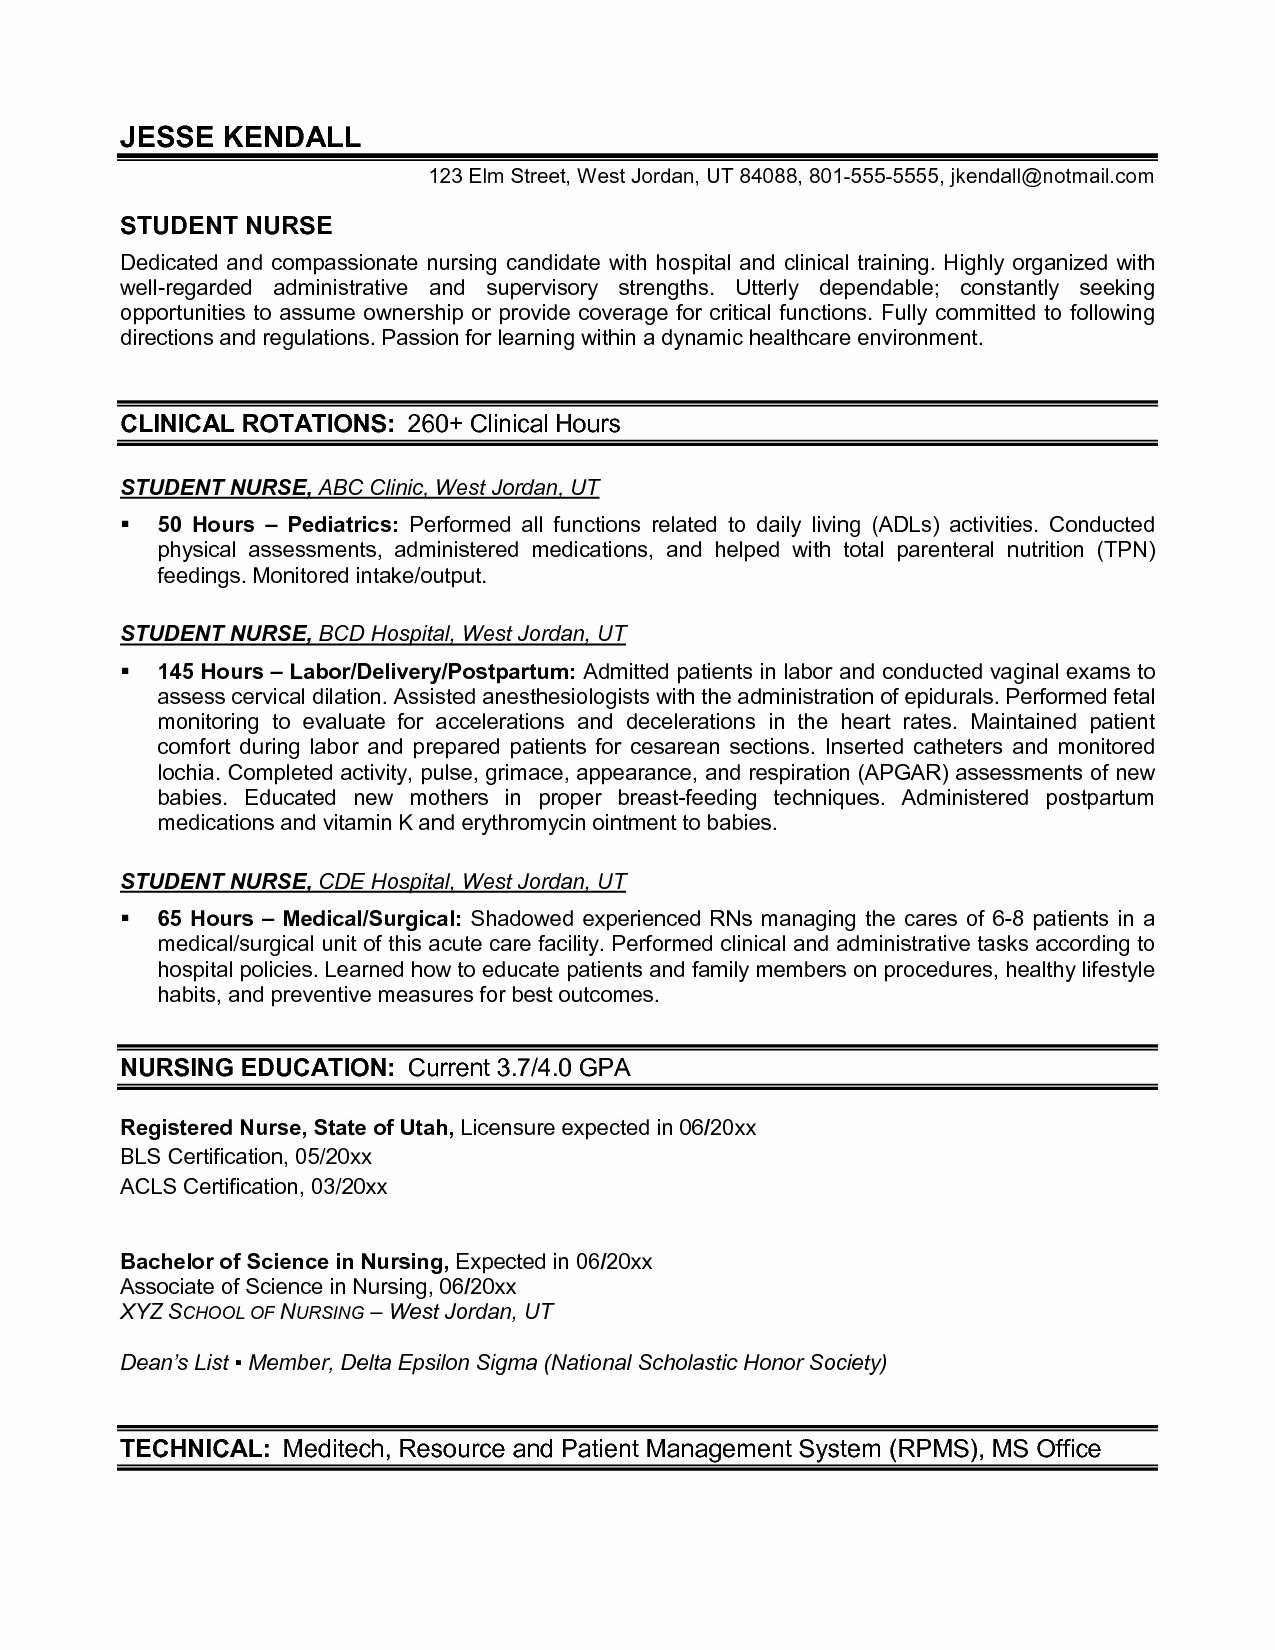 sample resume for graduate nursing scholml